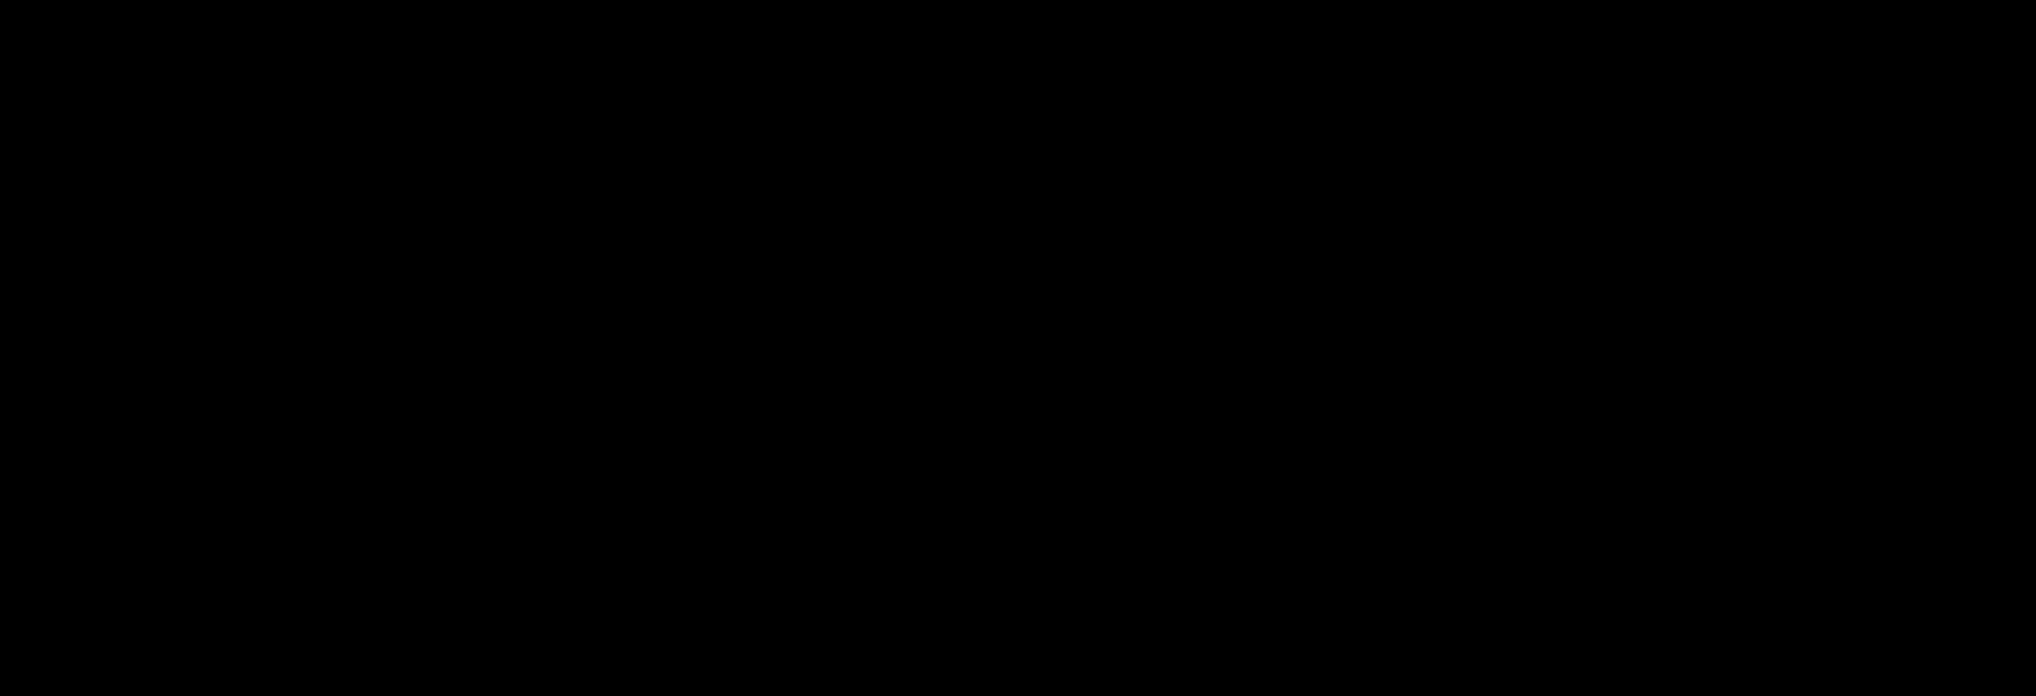 Stearoyl vanillylamide-d<sub>3</sub>